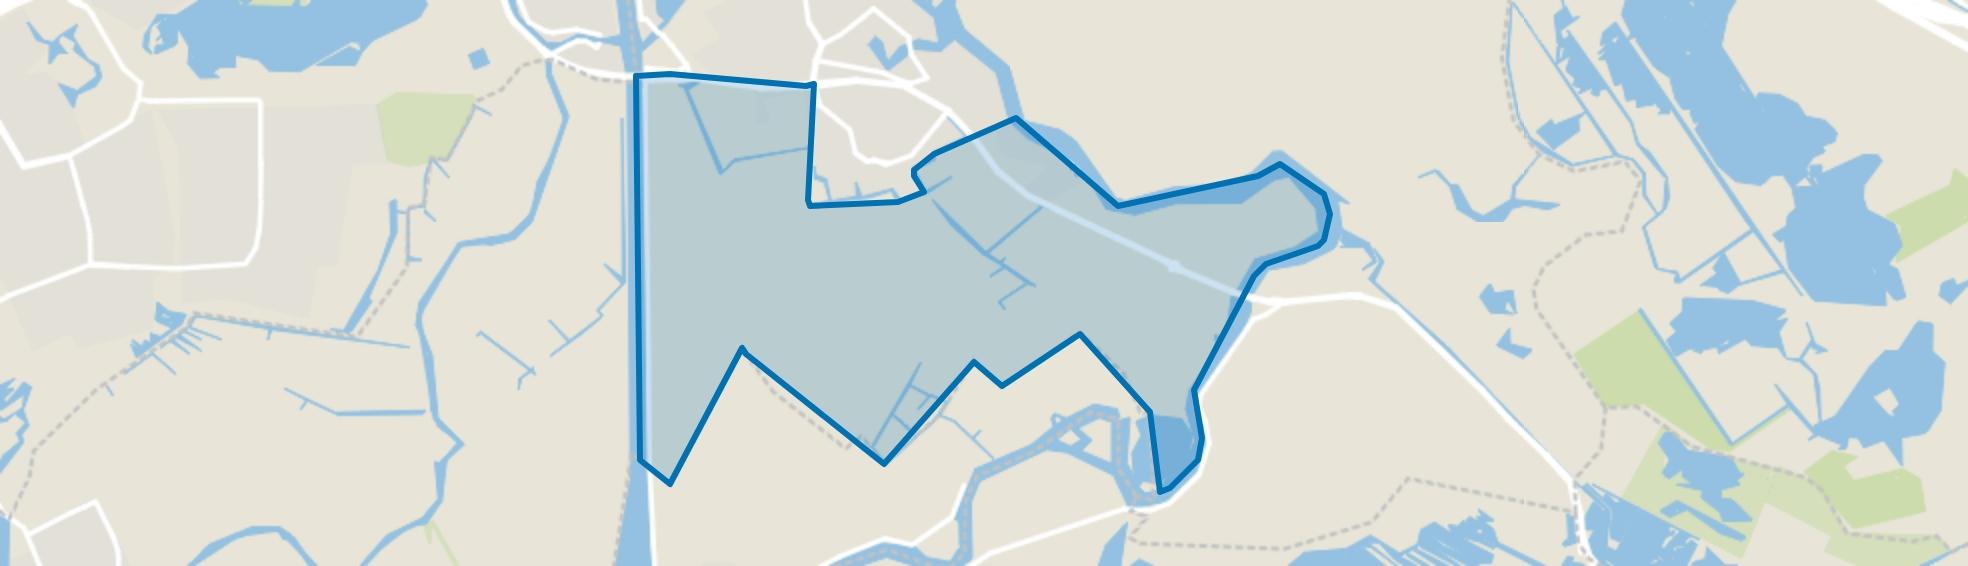 Aetsveldsepolder, Weesp map